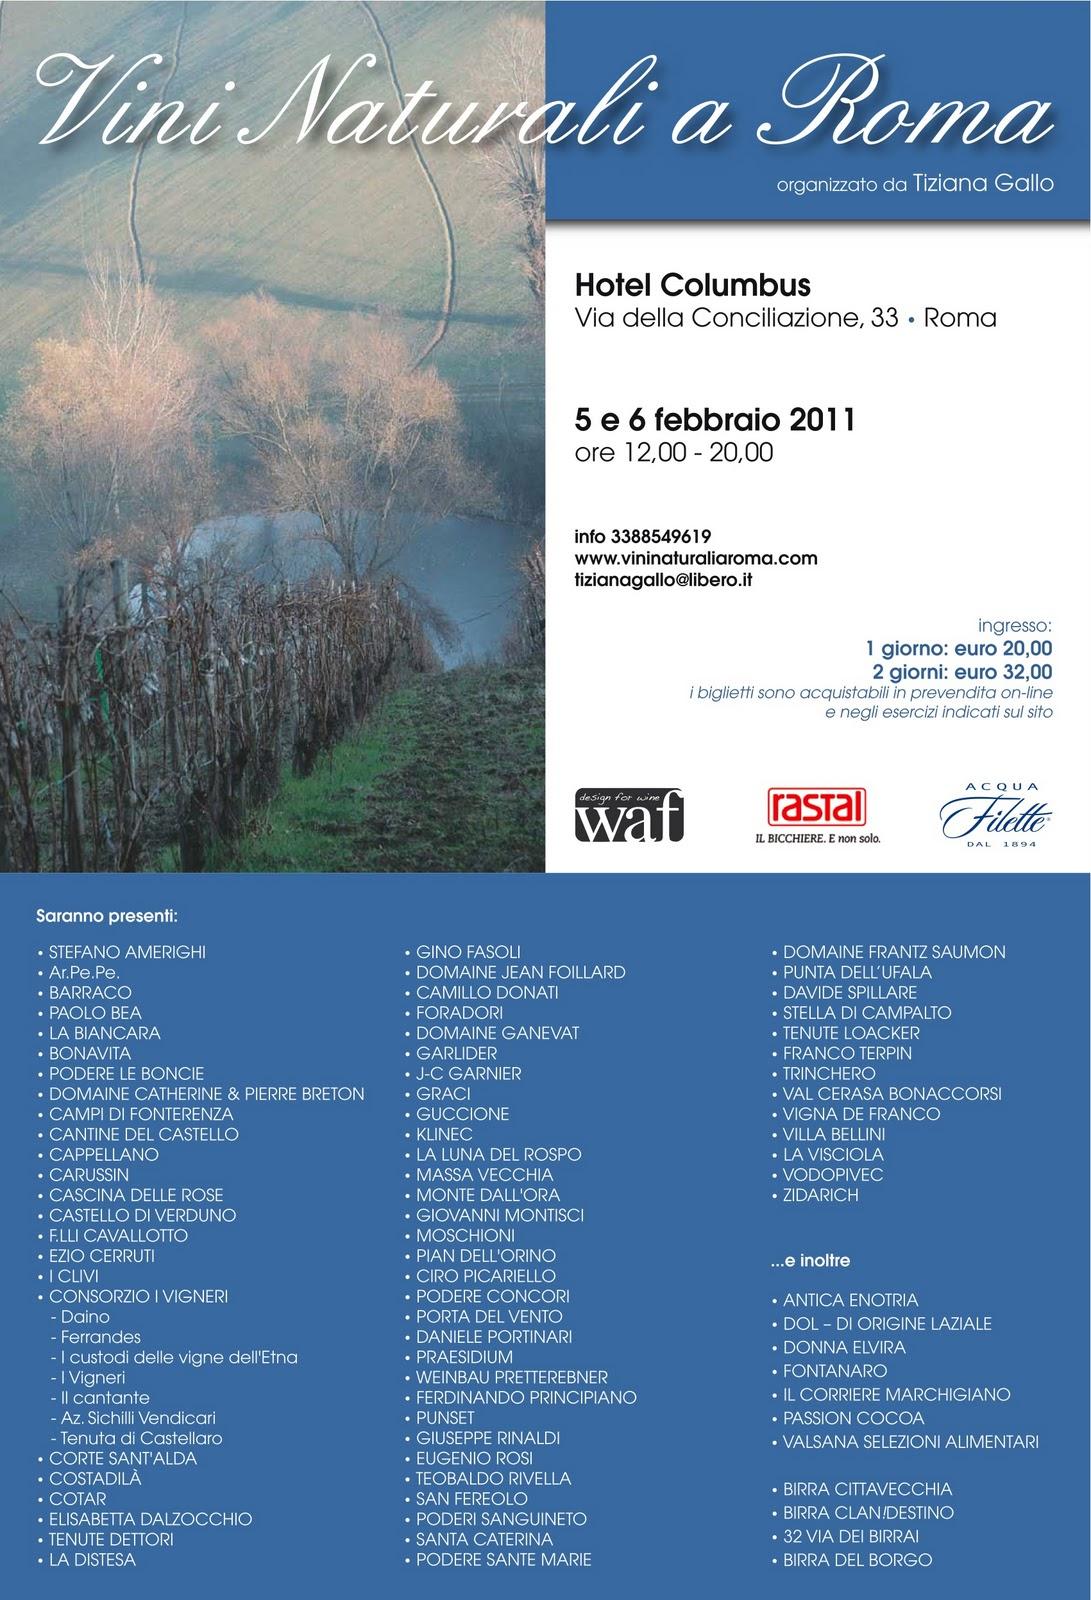 5-6 febbraio, Vini Naturali a Roma